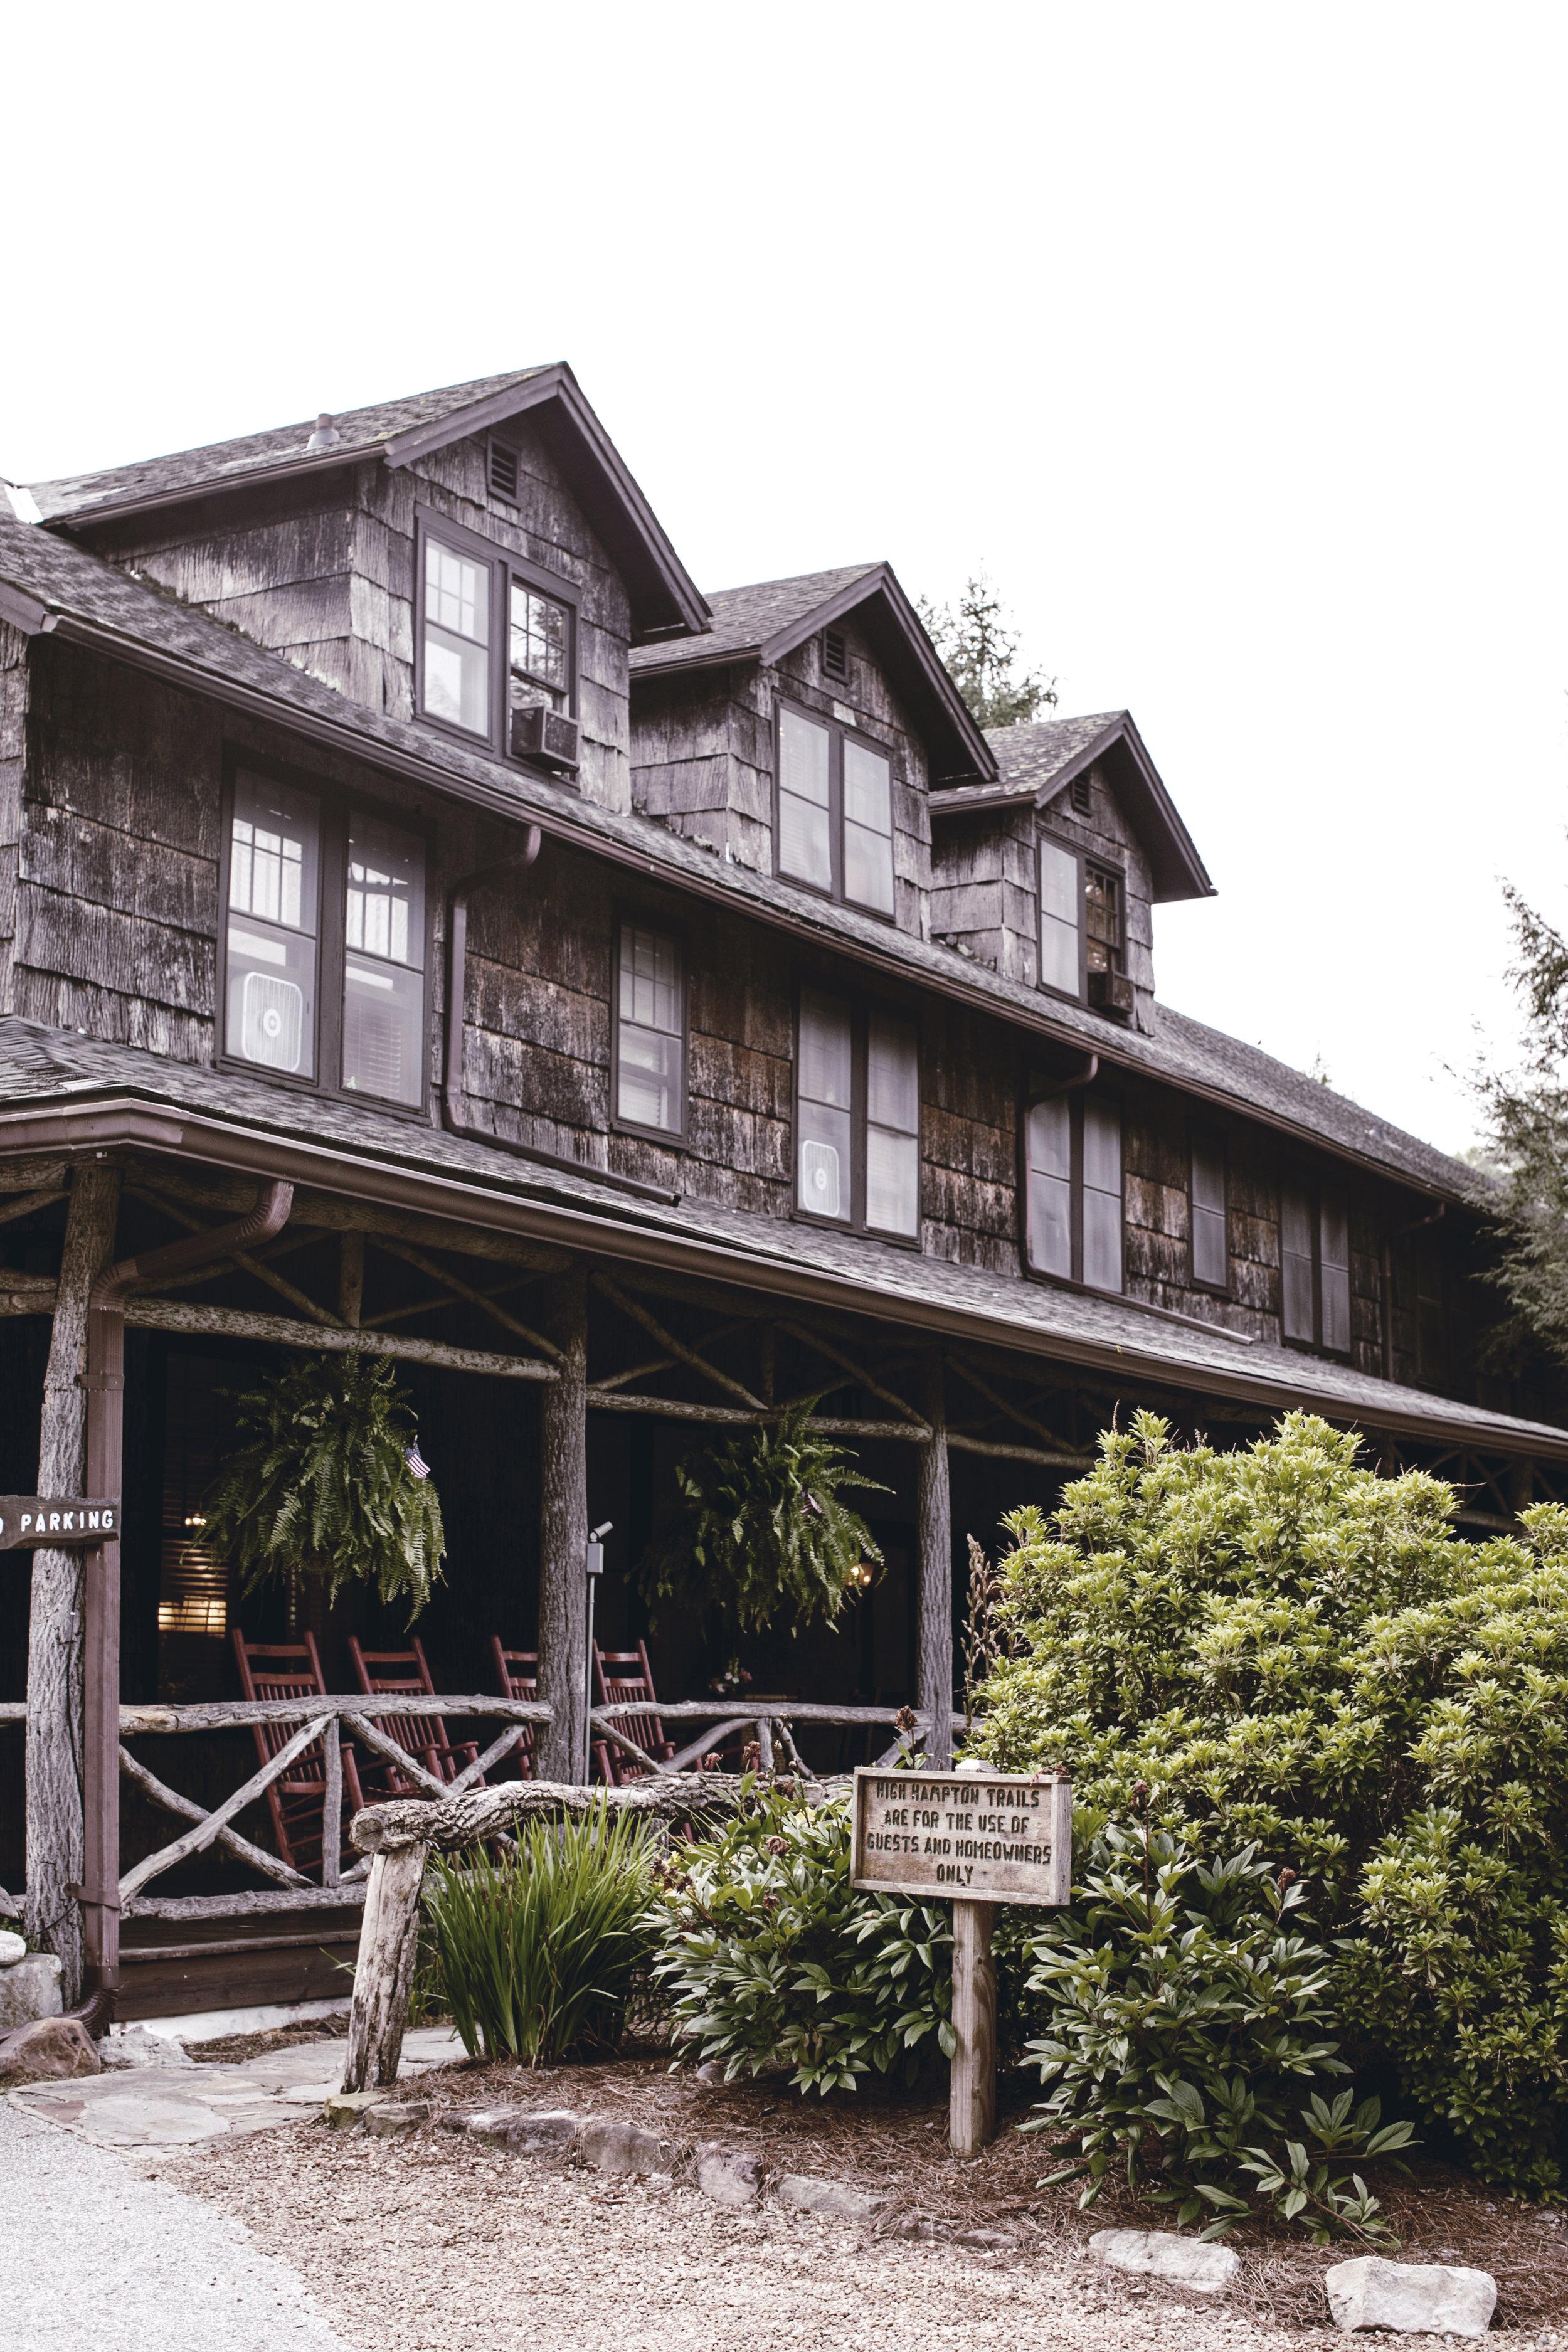 high Hampton inn / cashiers North Carolina / heirloomed